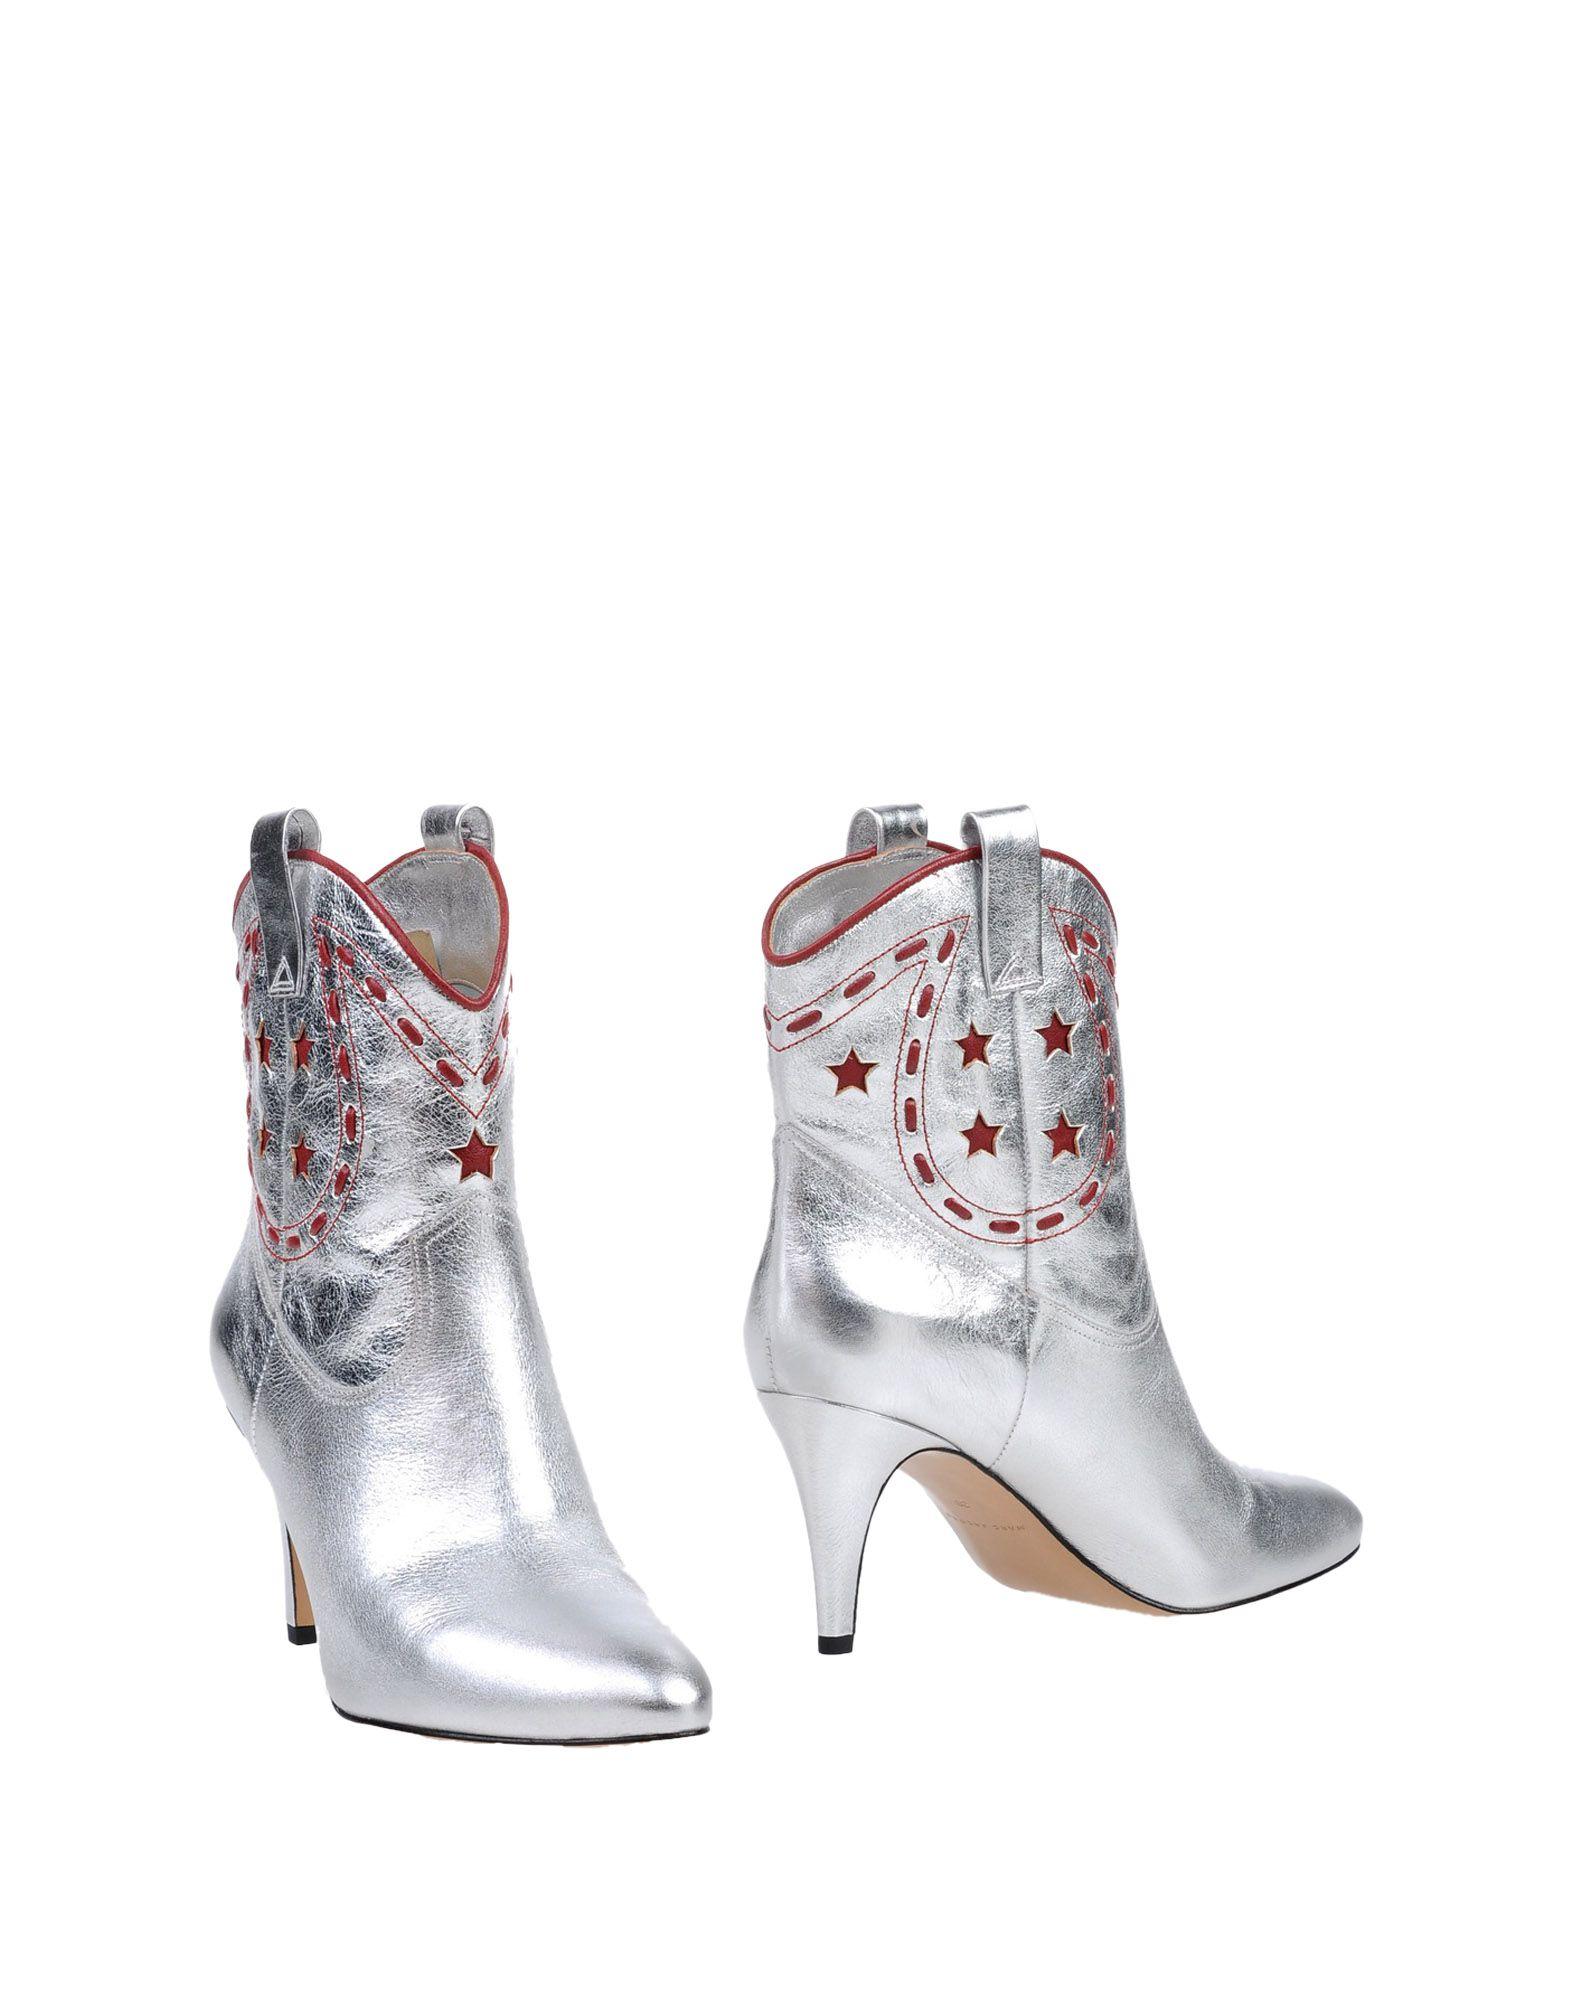 Marc Marc Marc Jacobs Stiefelette Damen  11381195CF Gute Qualität beliebte Schuhe 78c8a9